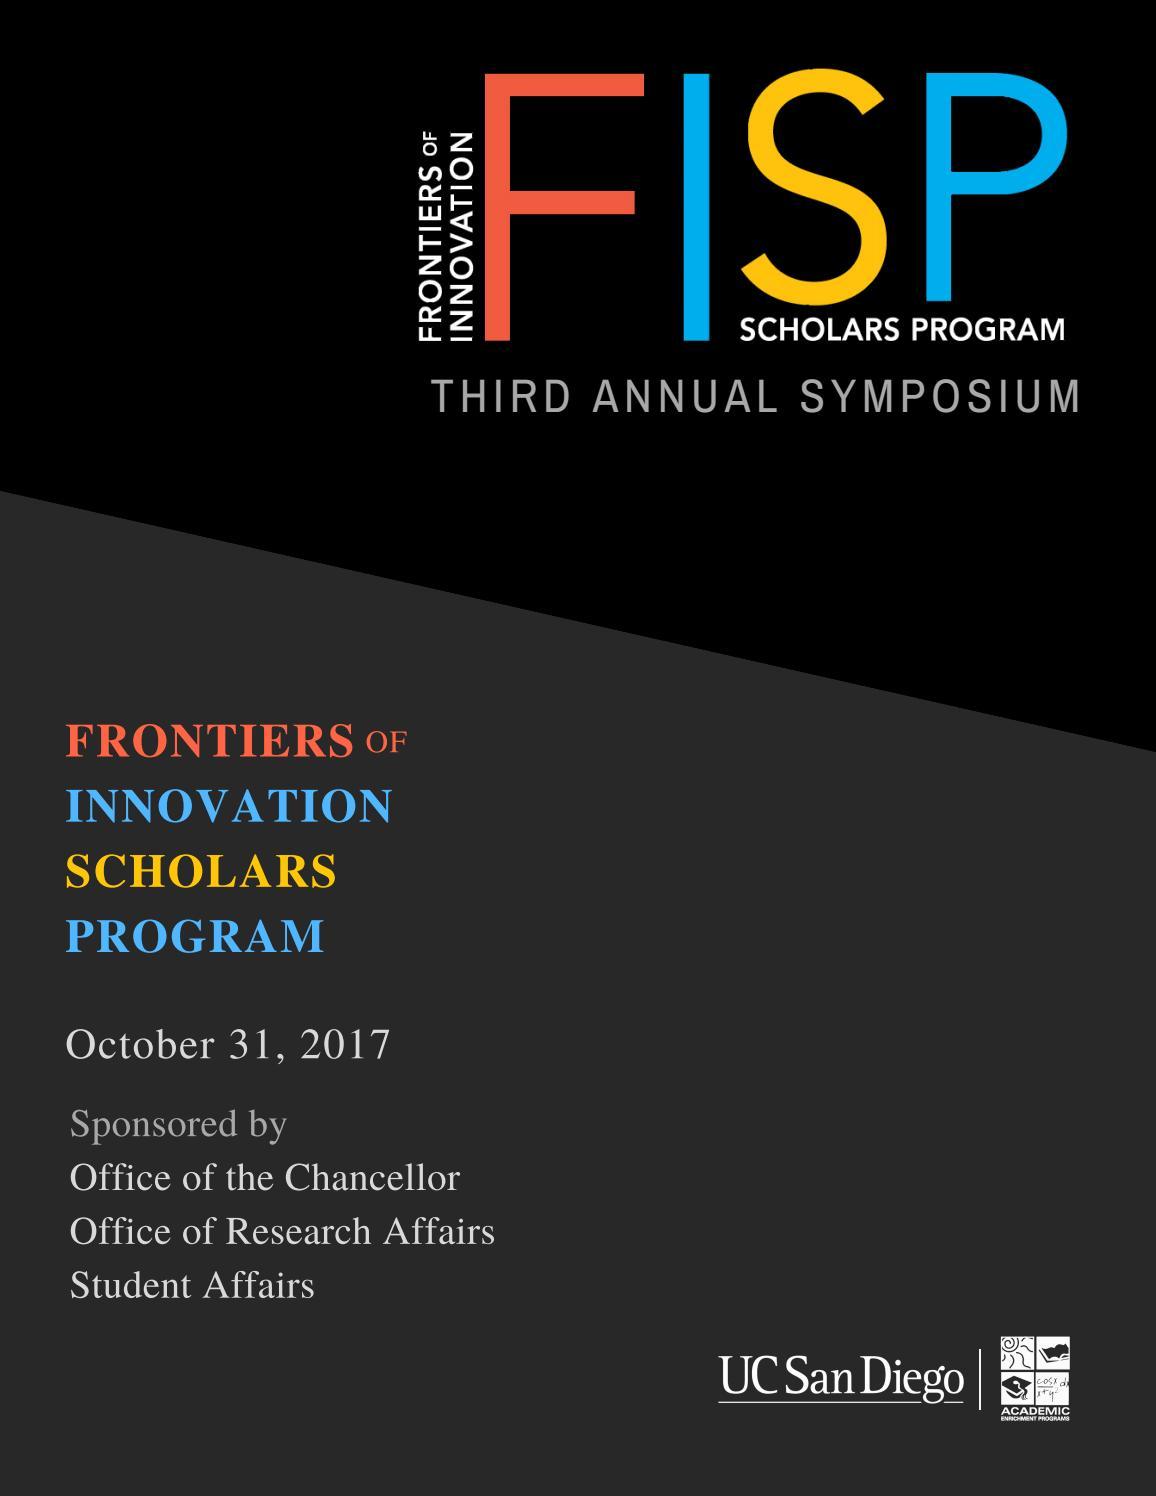 2017 Fisp Symposium Program By Academic Enrichment Programs Uc San Robotics Prometheus Pcb Maker Automates Circuit Board Creation Video Diego Issuu